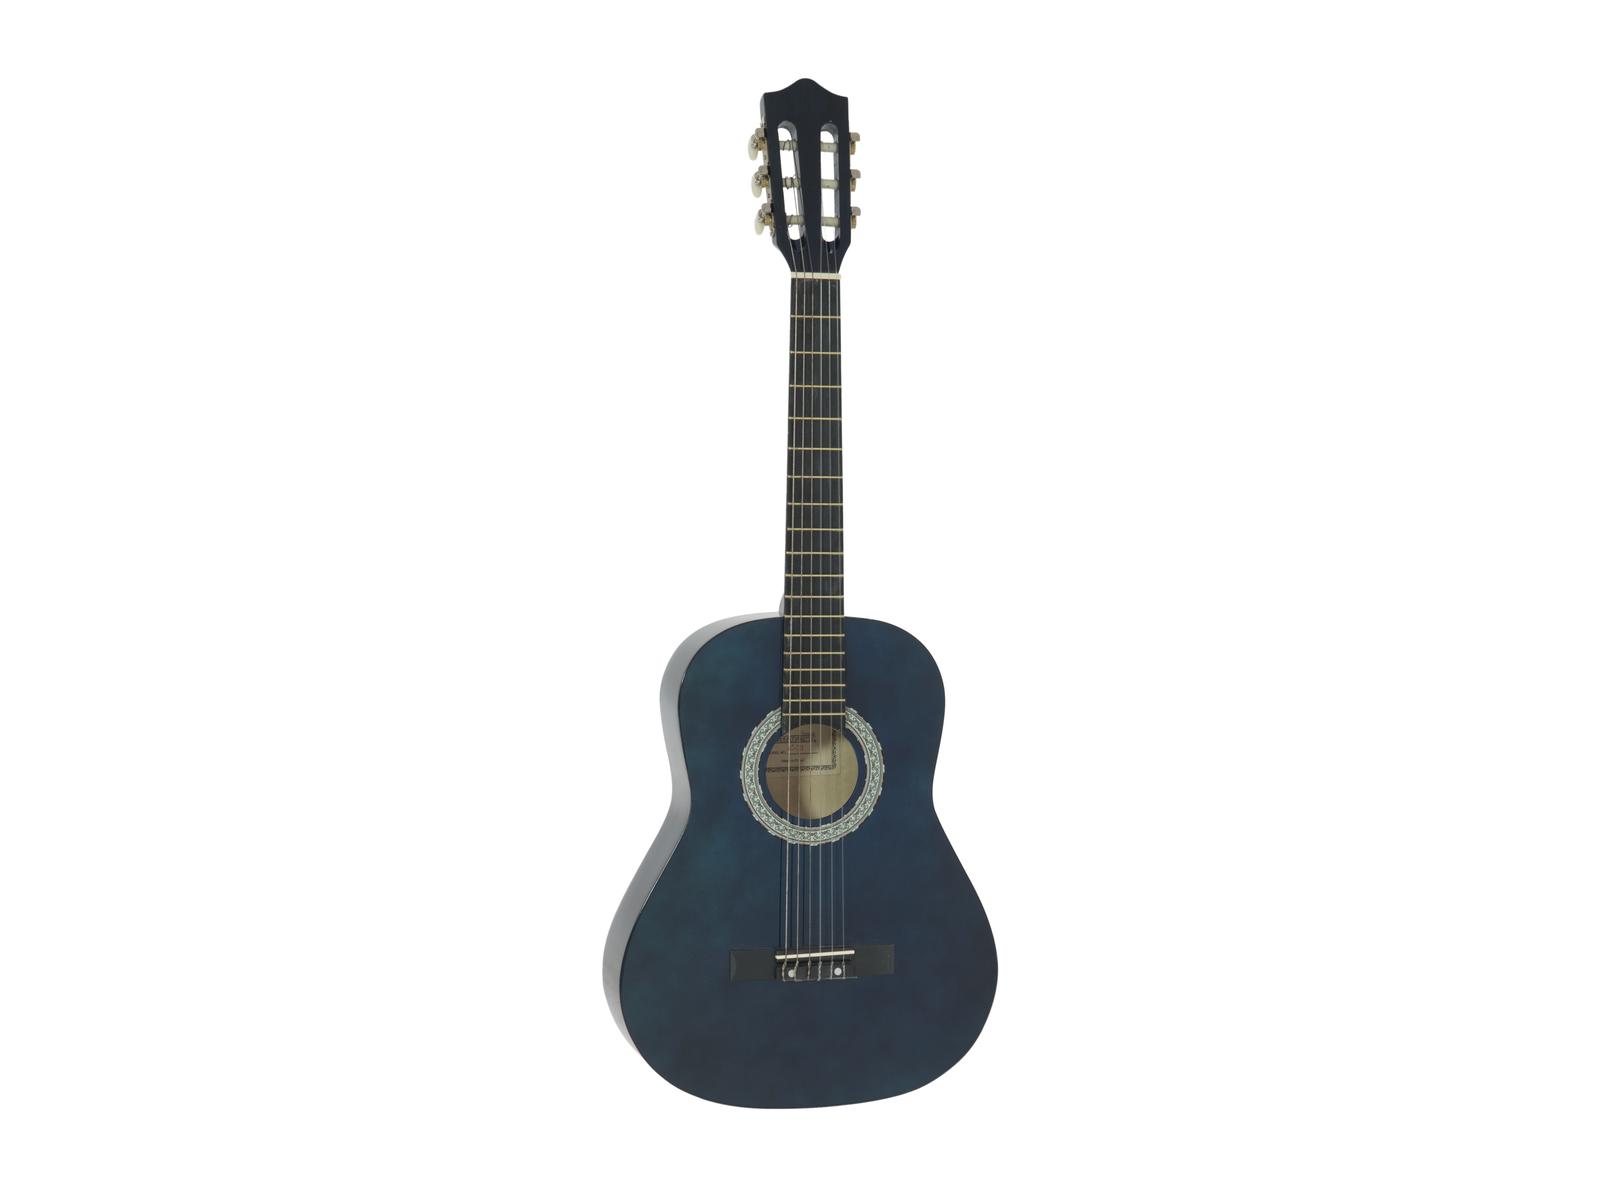 DIMAVERY AC-303 Klassikgitarre 3/4, blau